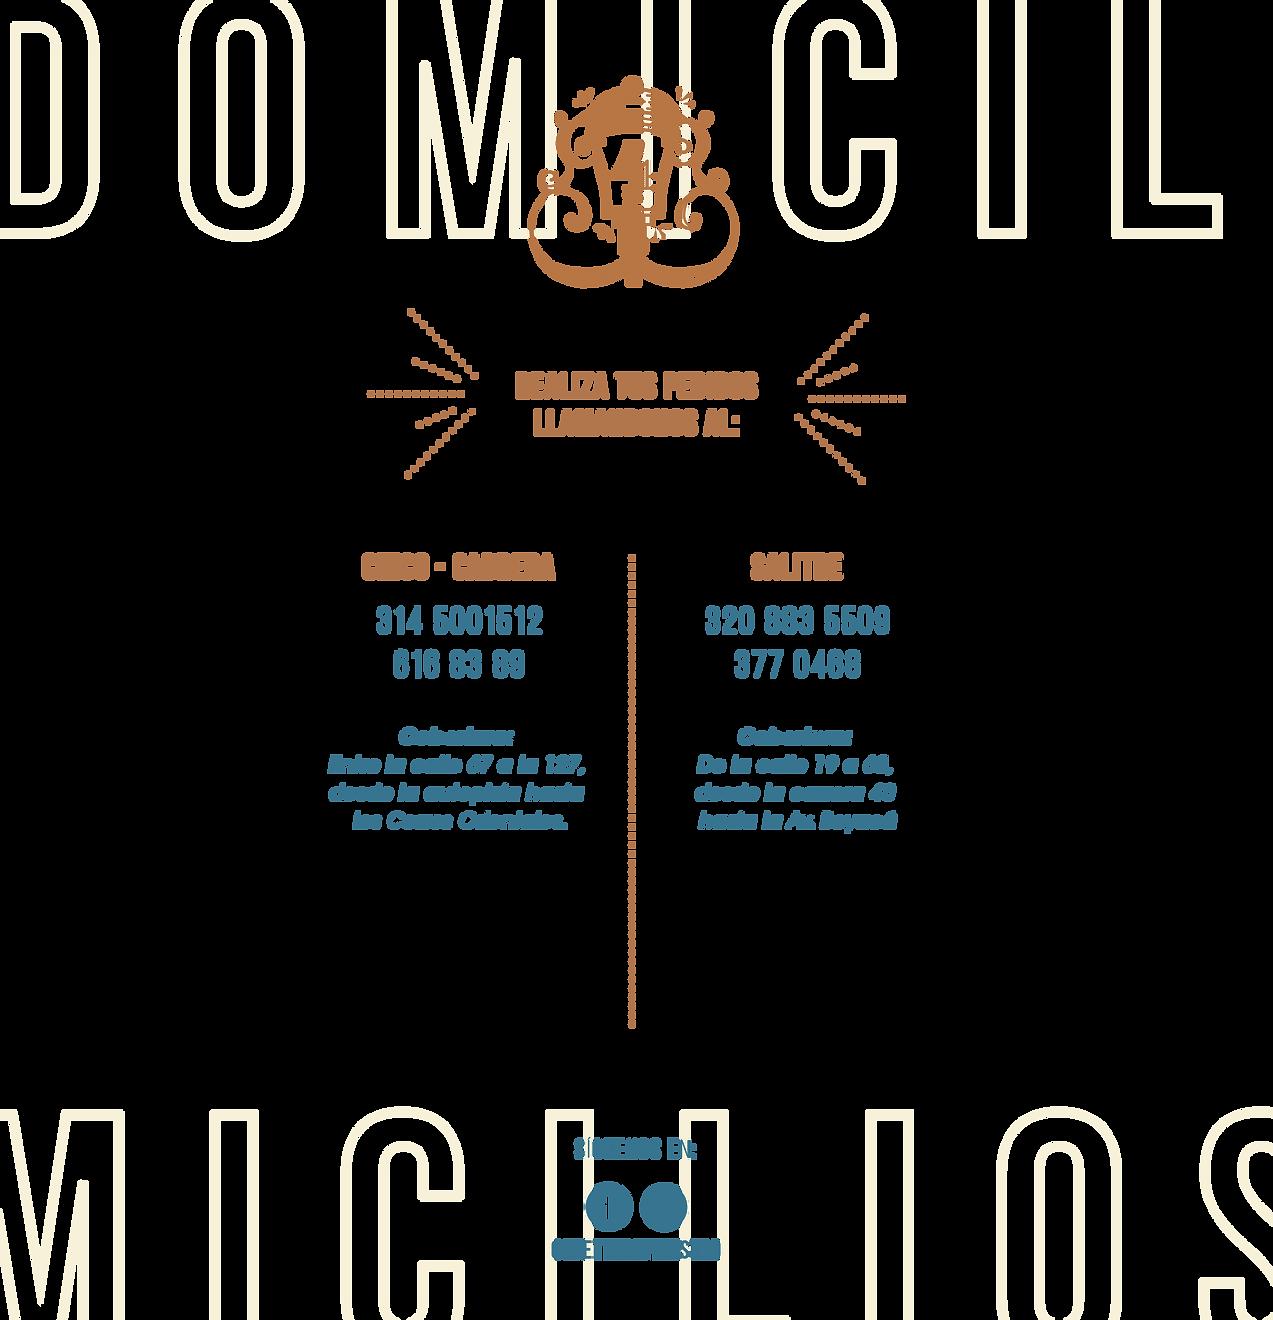 domicilios2.png